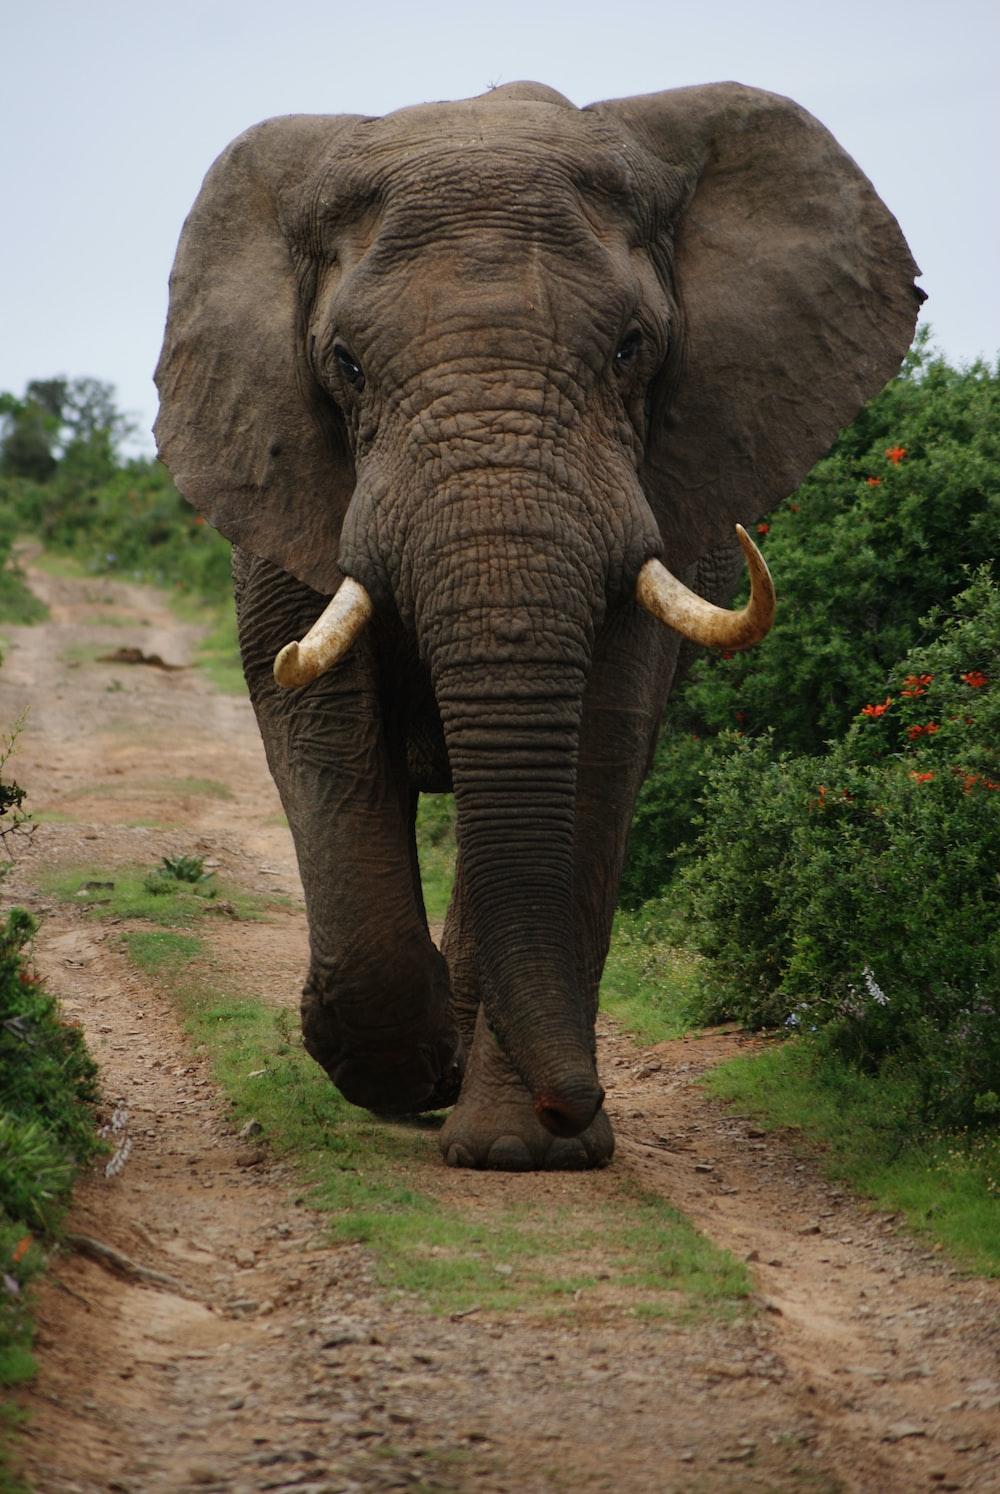 gray elephant walking beside green plants during daytime